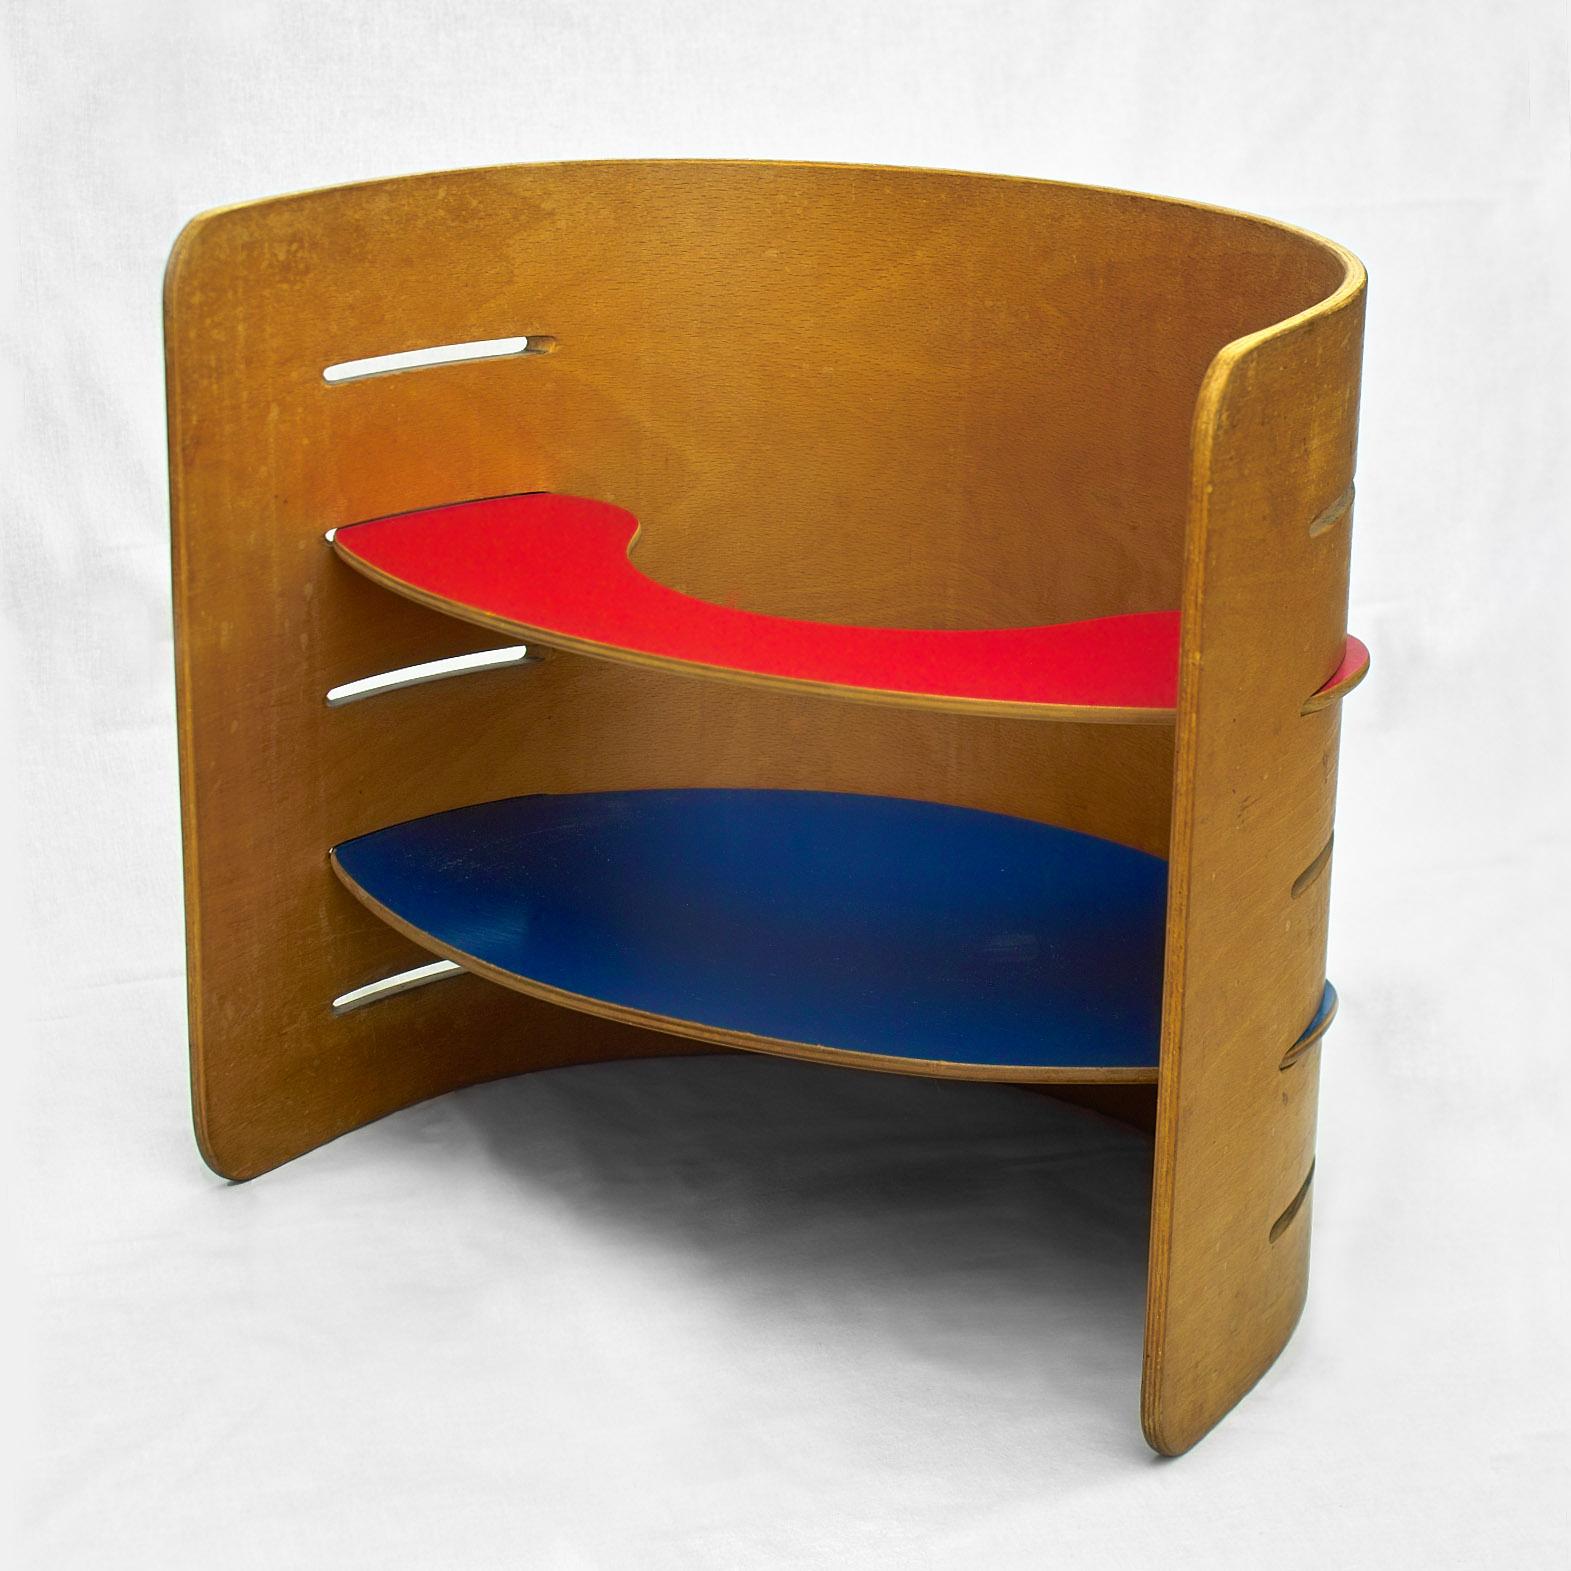 Childrens furniture file:vedel childrens furniture gh.jpg MHIZKDV